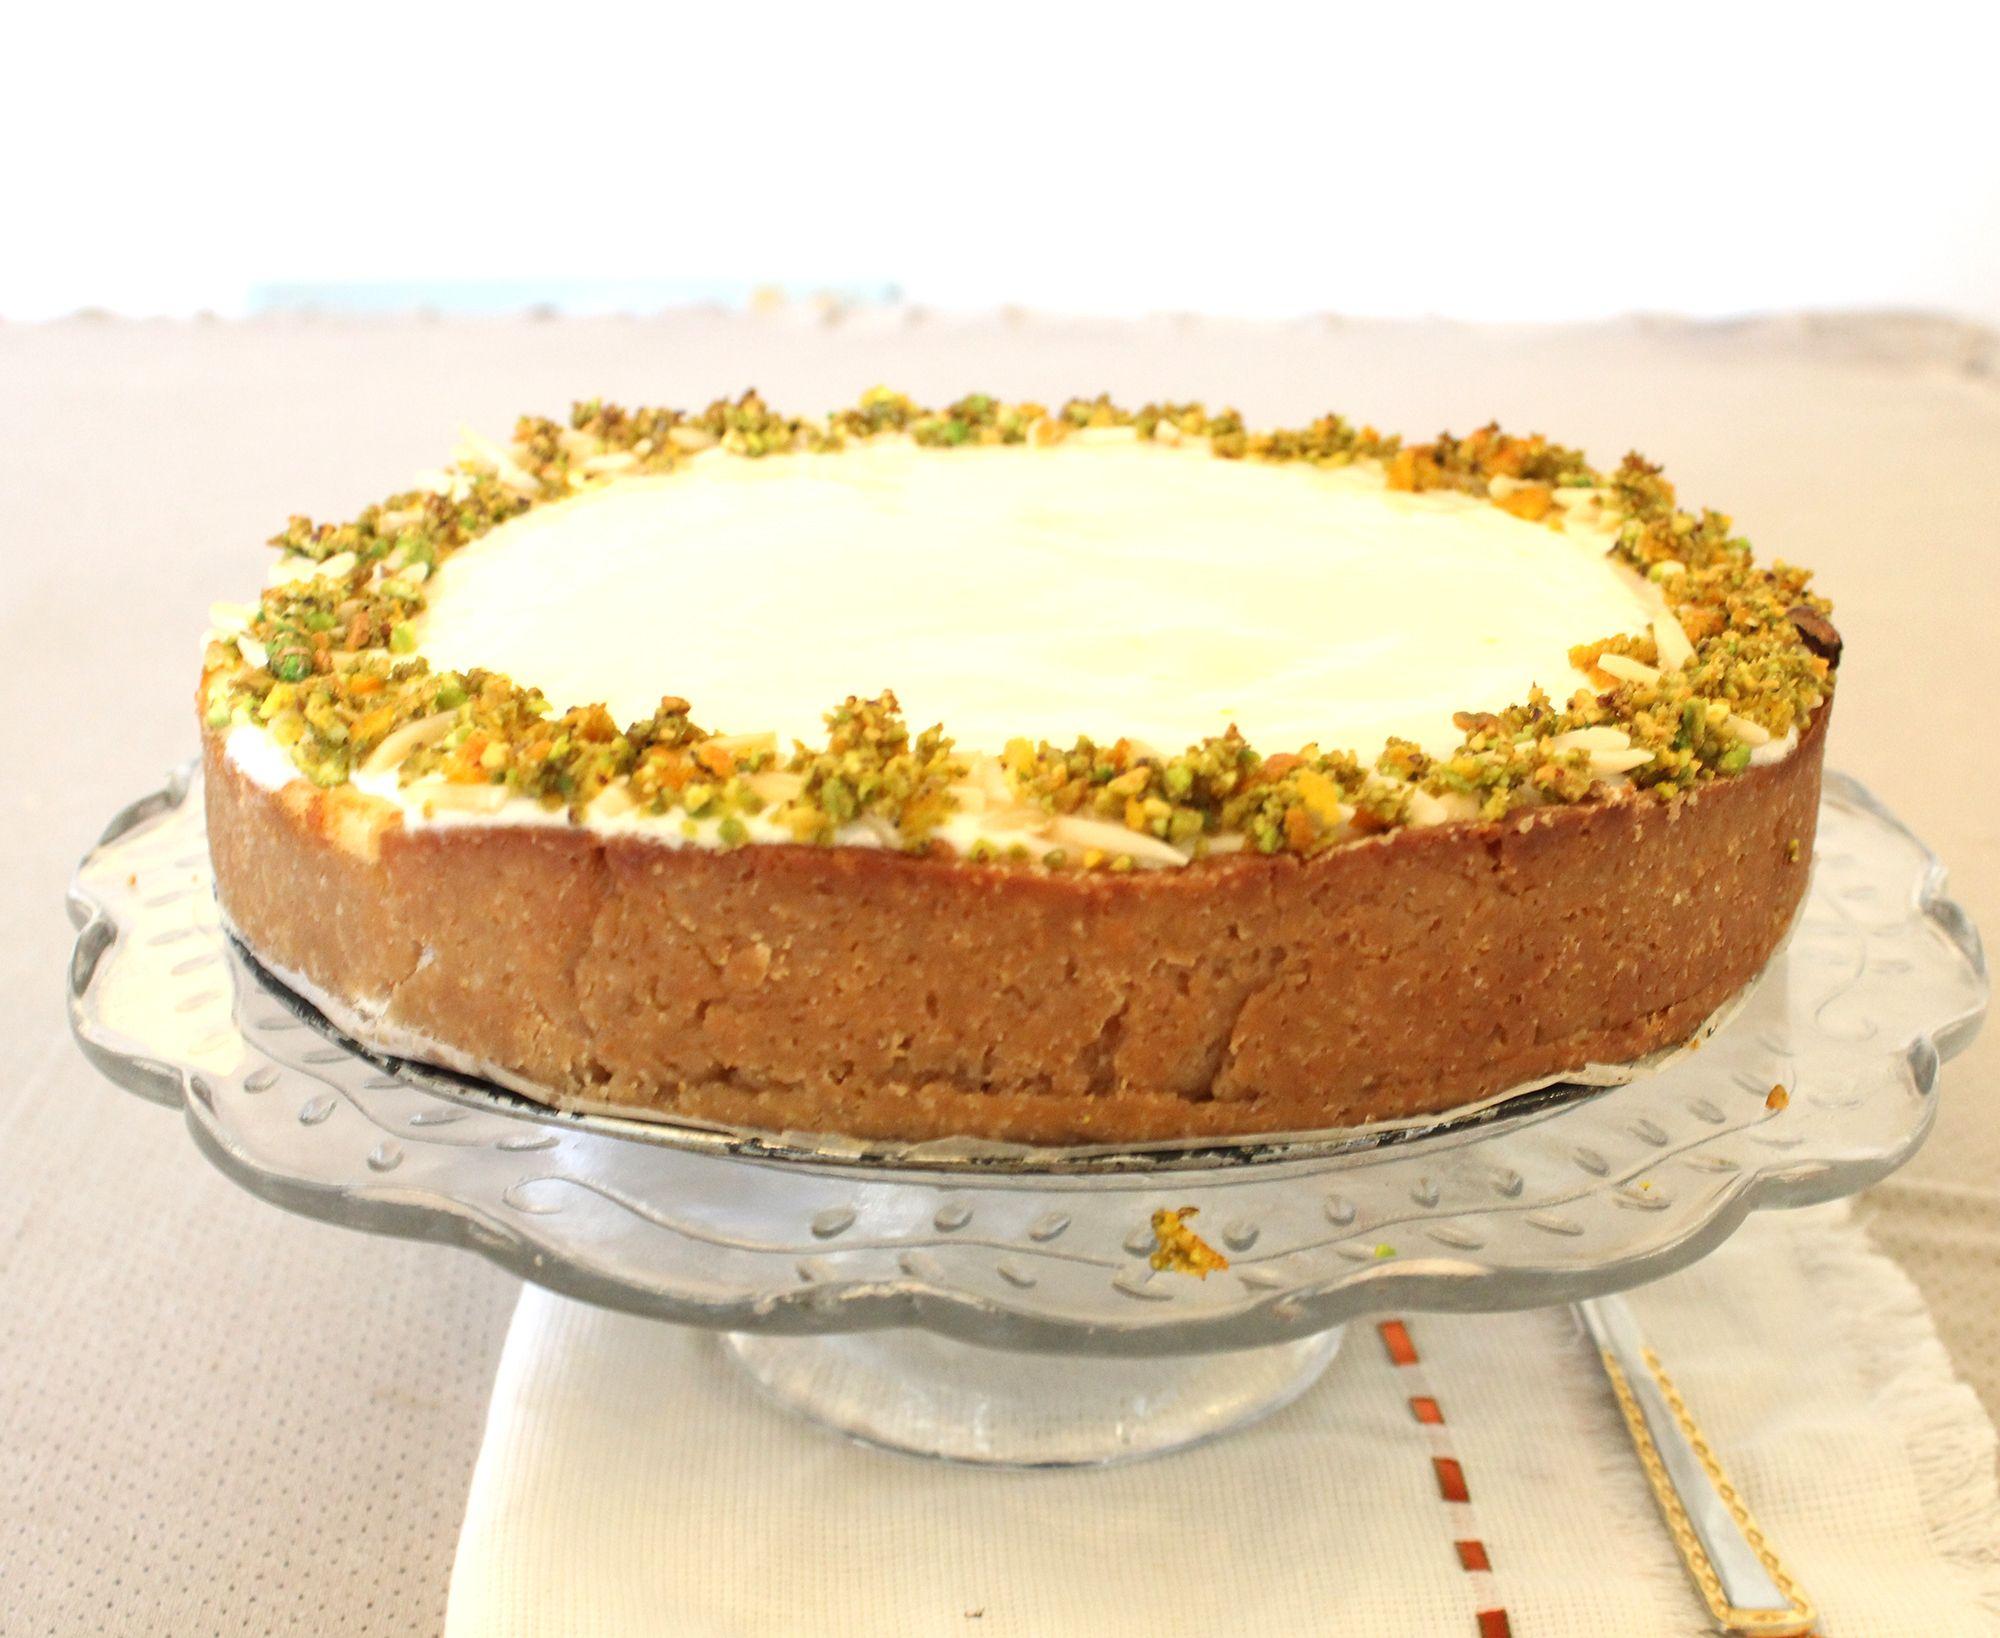 IMG 3773 - עוגת גבינה בניחוח פרות הדר